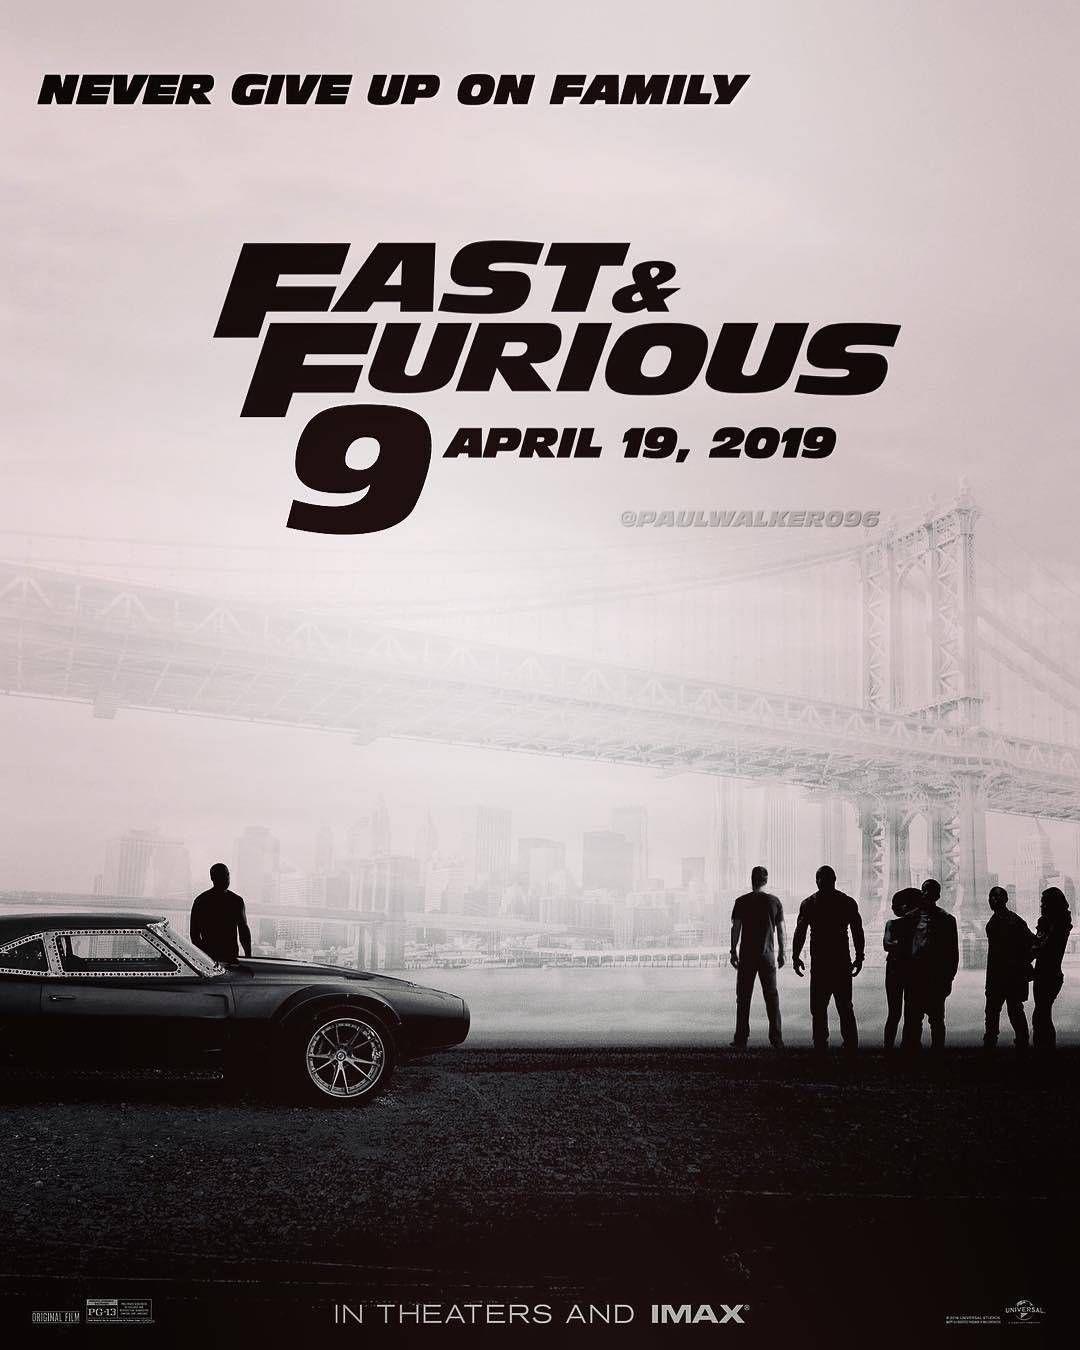 Fast Furious Ofurious8 Never Give Up On Family Yooying Movie Fast And Furious Fast And Furious Zayn Malik Pics